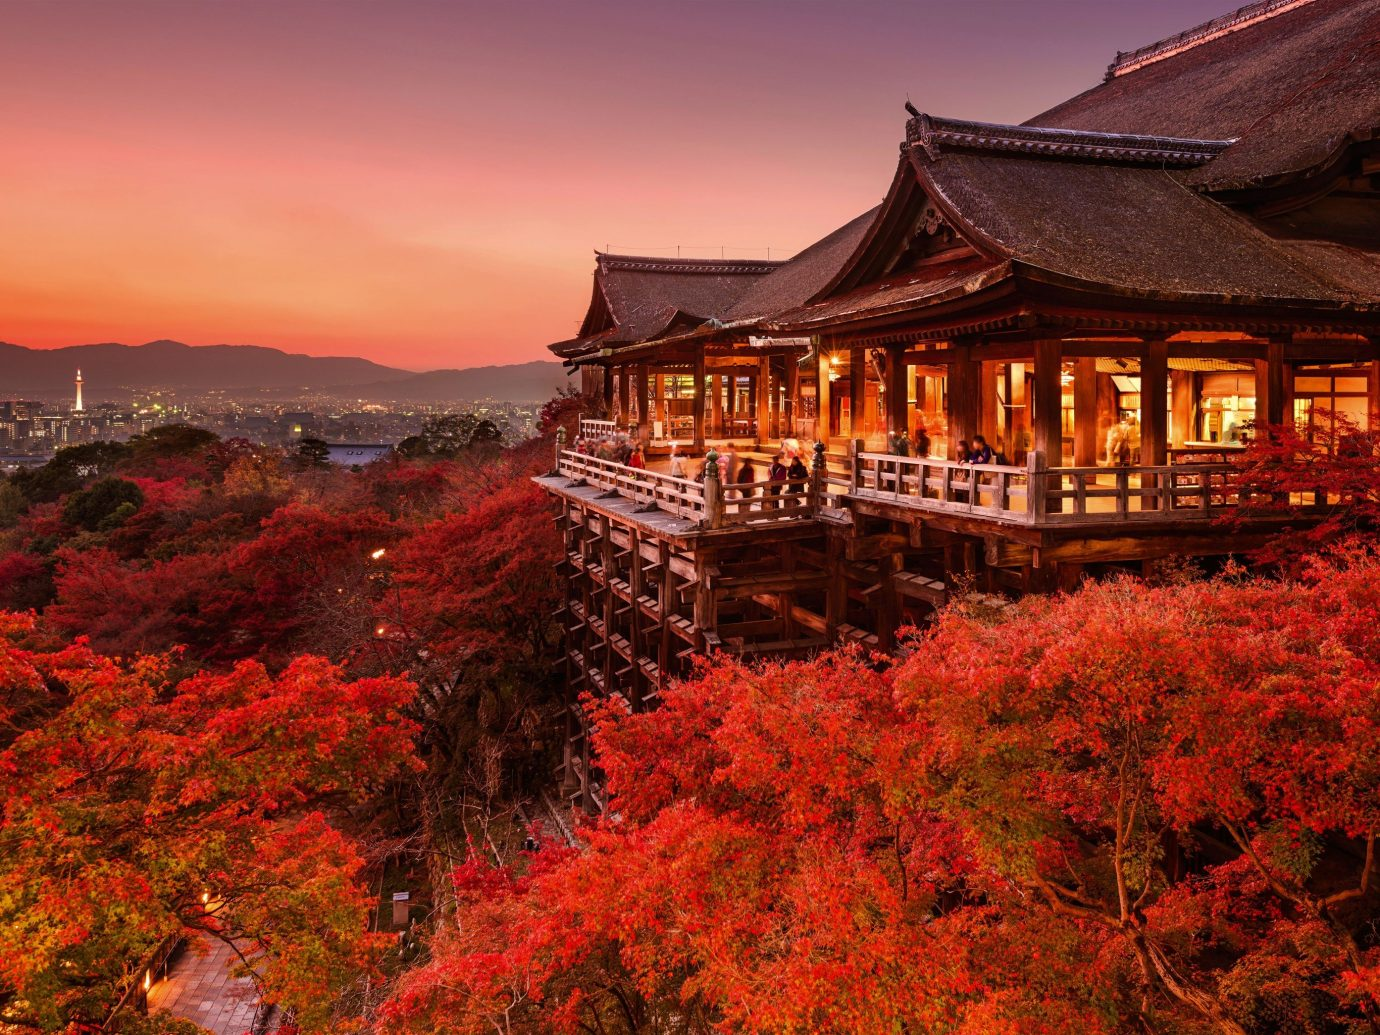 Trip Ideas outdoor sky tree autumn season leaf mountain evening Sunset dusk traveling hillside lush